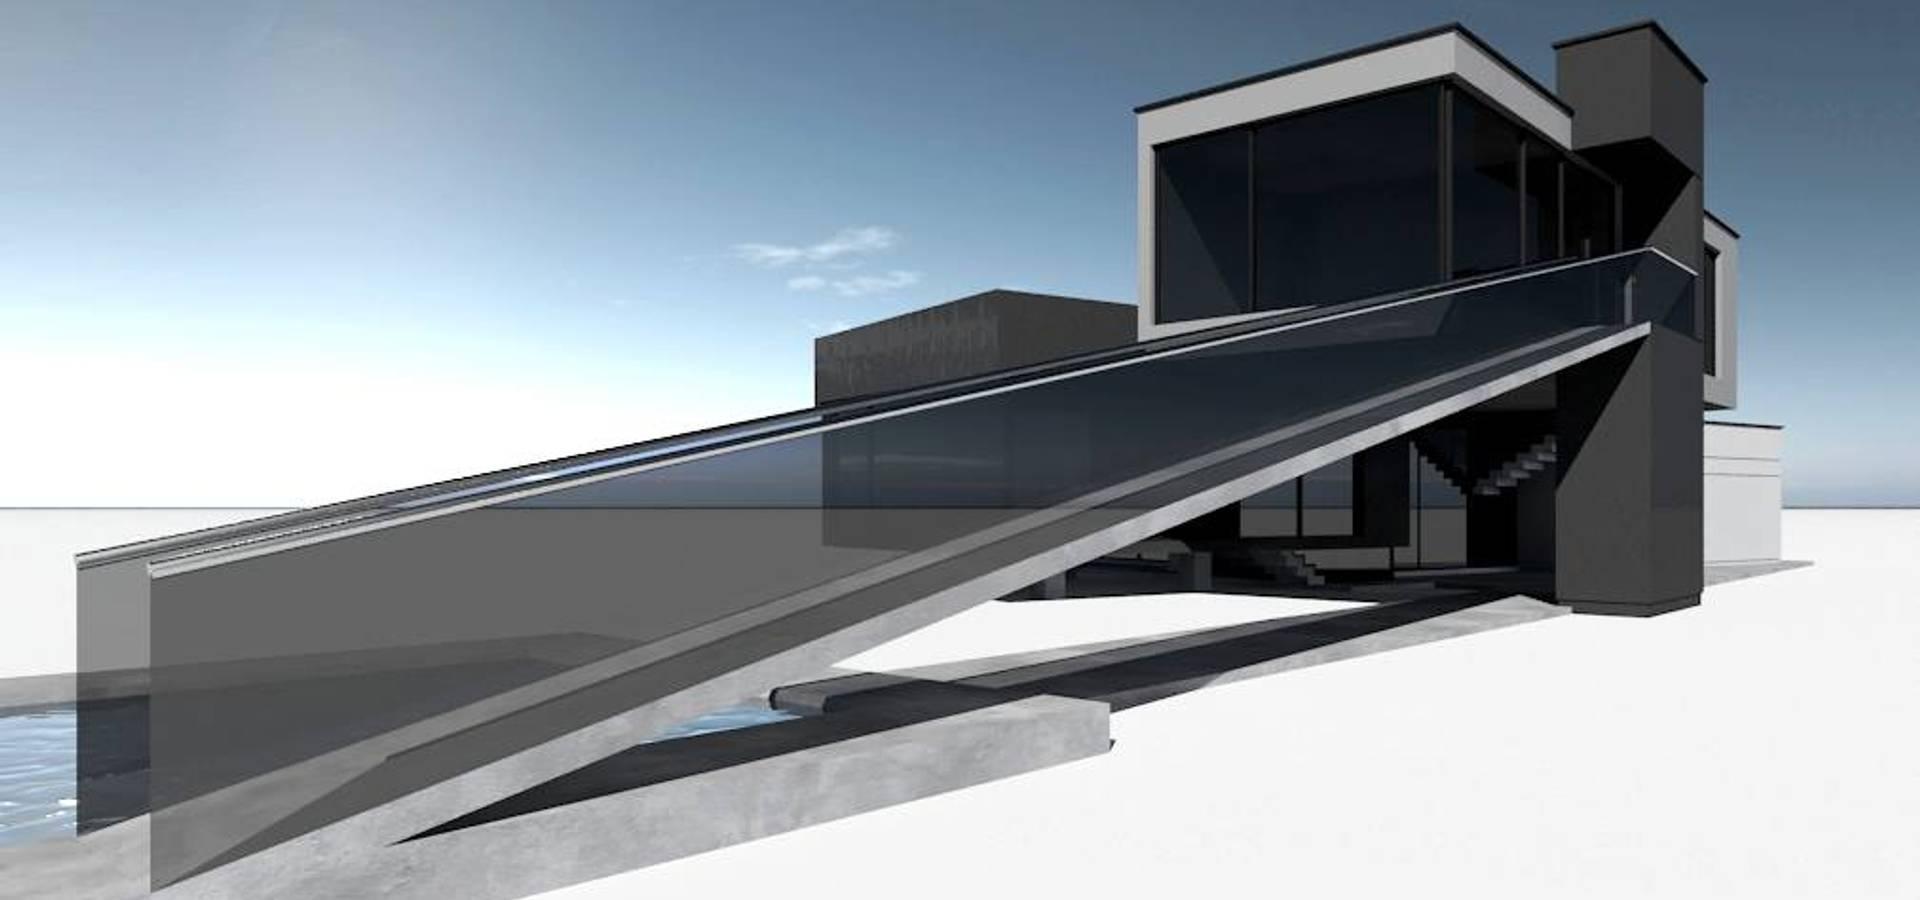 Hugo Mur Arquitecto